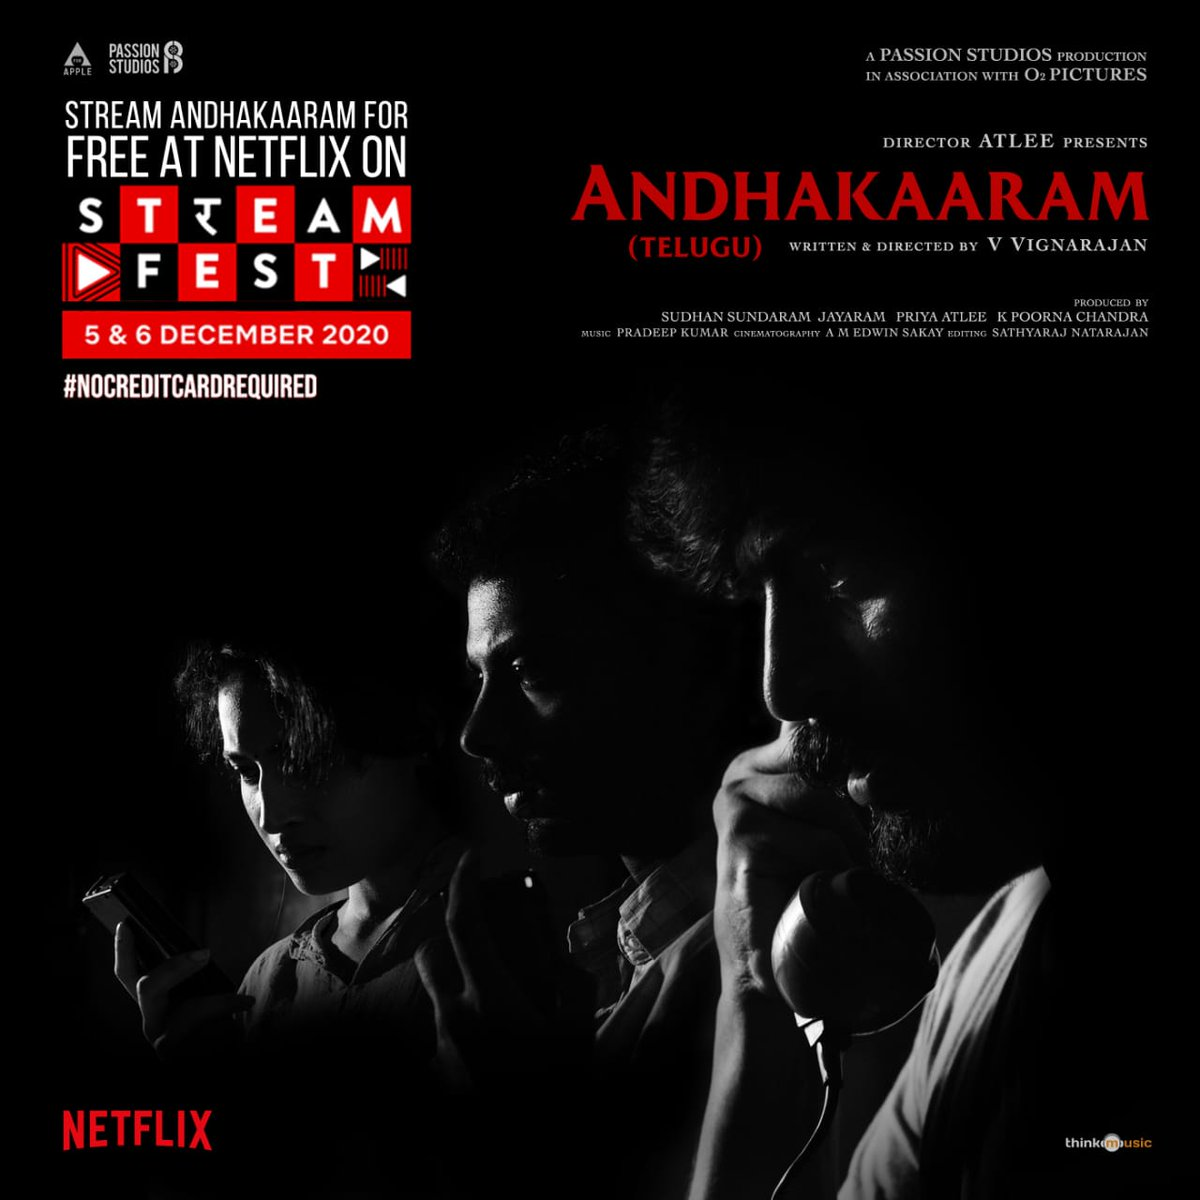 watch #Andhakaaram on Netflix for free during this weekend.On December 5 & 6,  @Atlee_dir @aforapple_offcl @PassionStudios_  @priyaatlee @Sudhans2017 @vvignarajan @iam_arjundas  #PradeepKumar @Jayaram_gj @vinoth_kishan @Poojaram22 @MishMash2611 @edwinsakaydop @thinkmusicindia